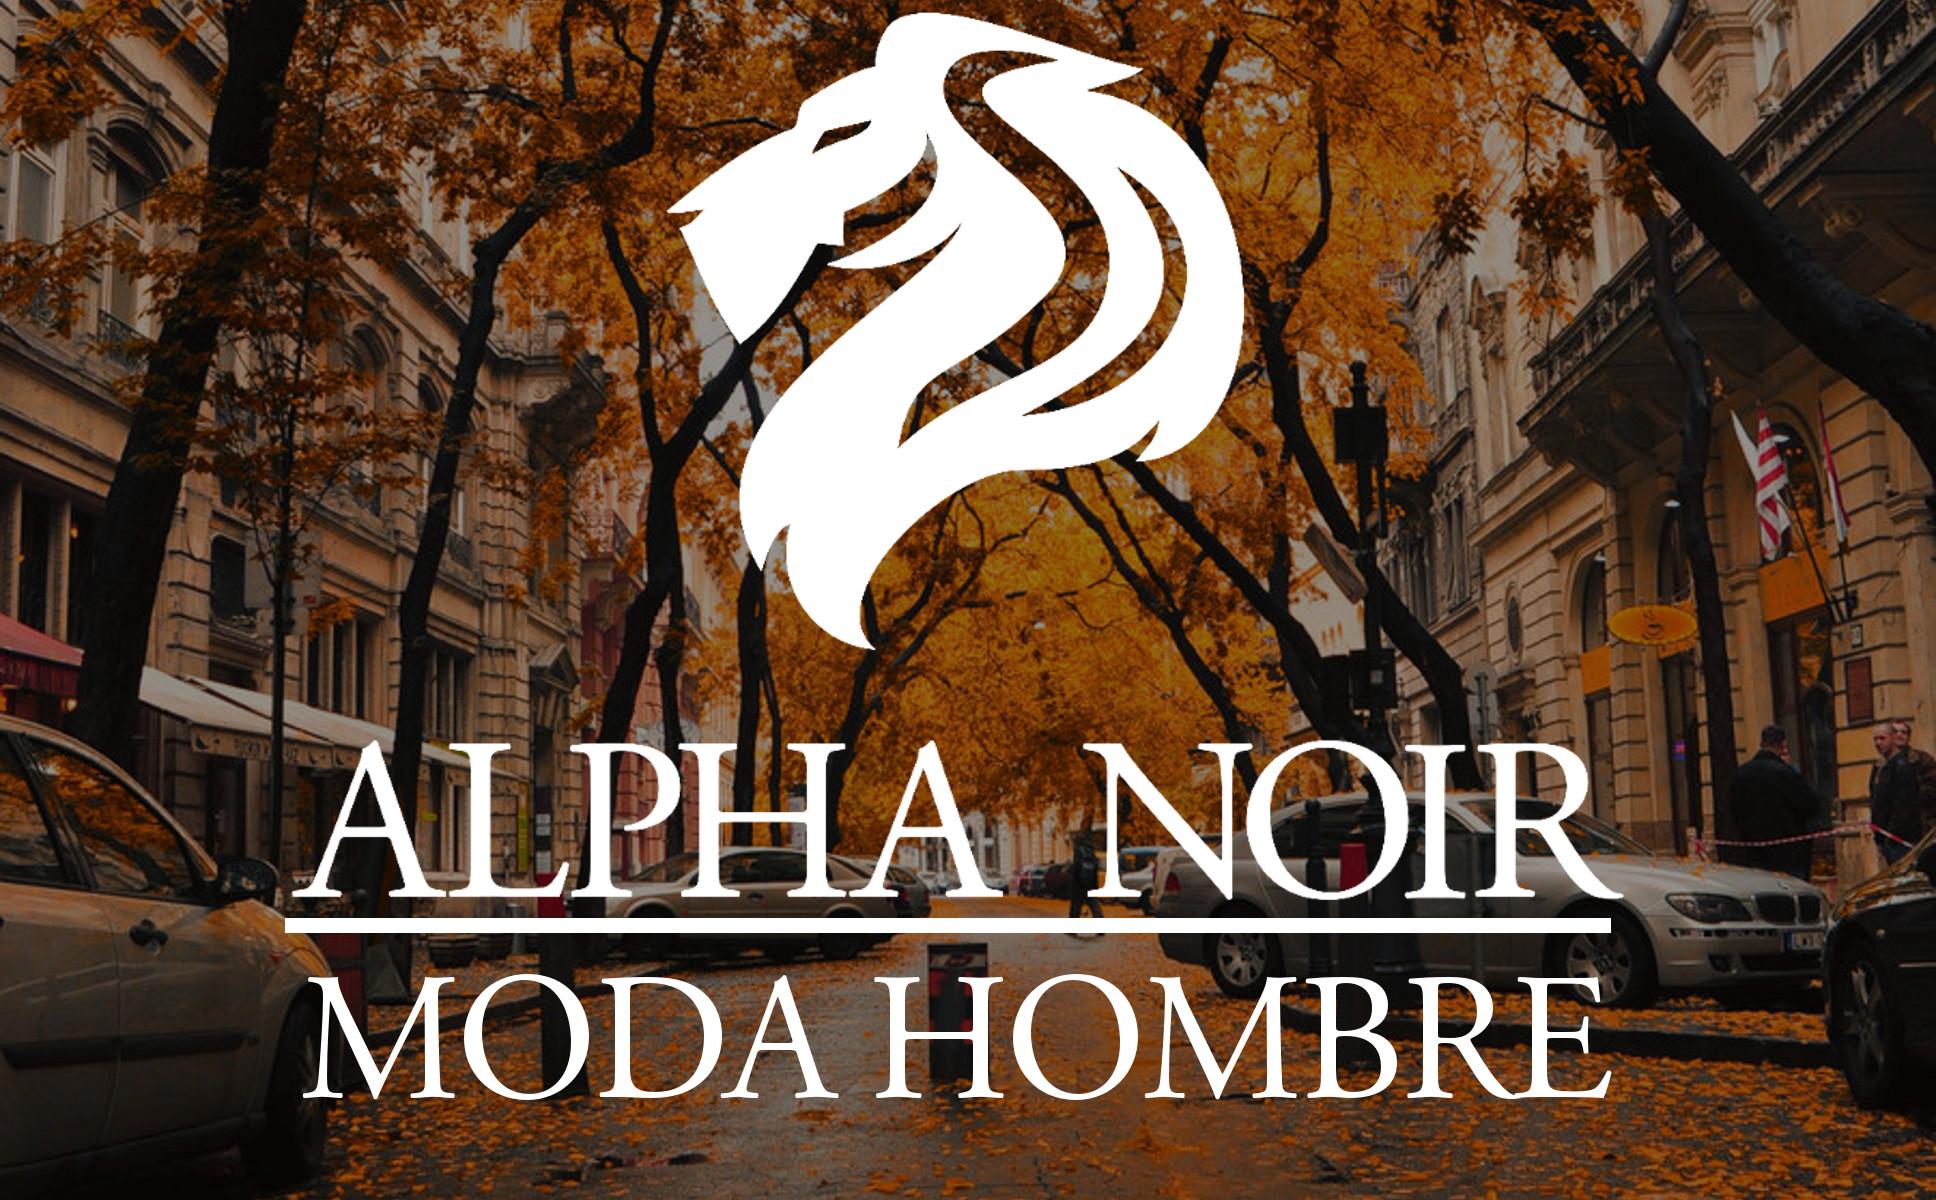 775ab3f340e4 alpha-noir-trends-como-vestir-un-traje-de-chaqueta - Alpha Noir Trends